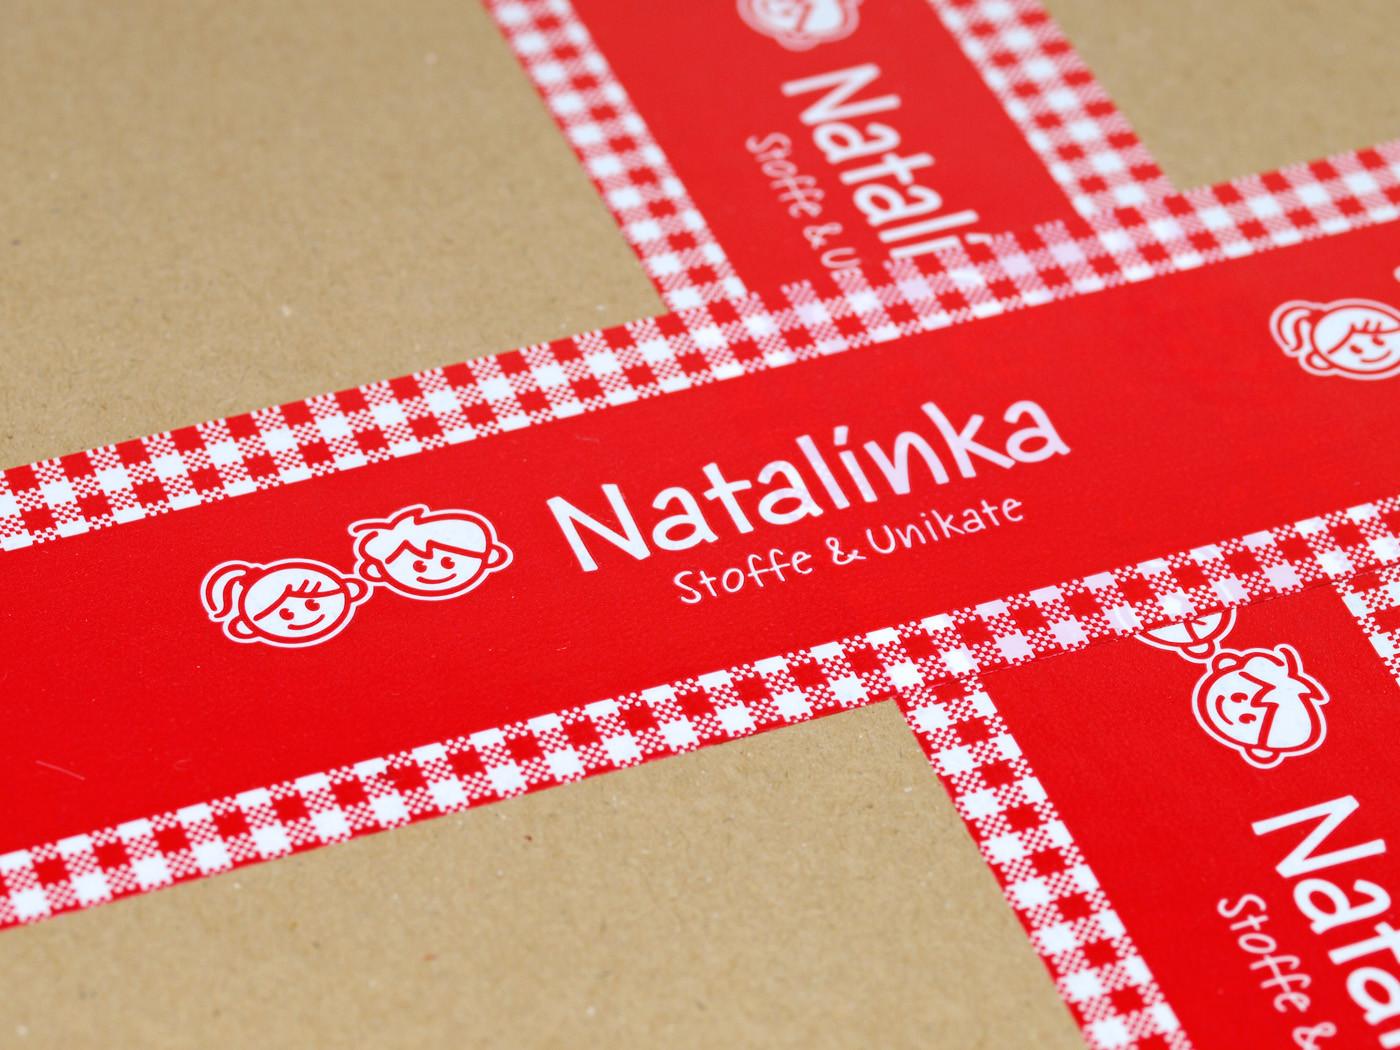 corporate_design_verpackung.jpg